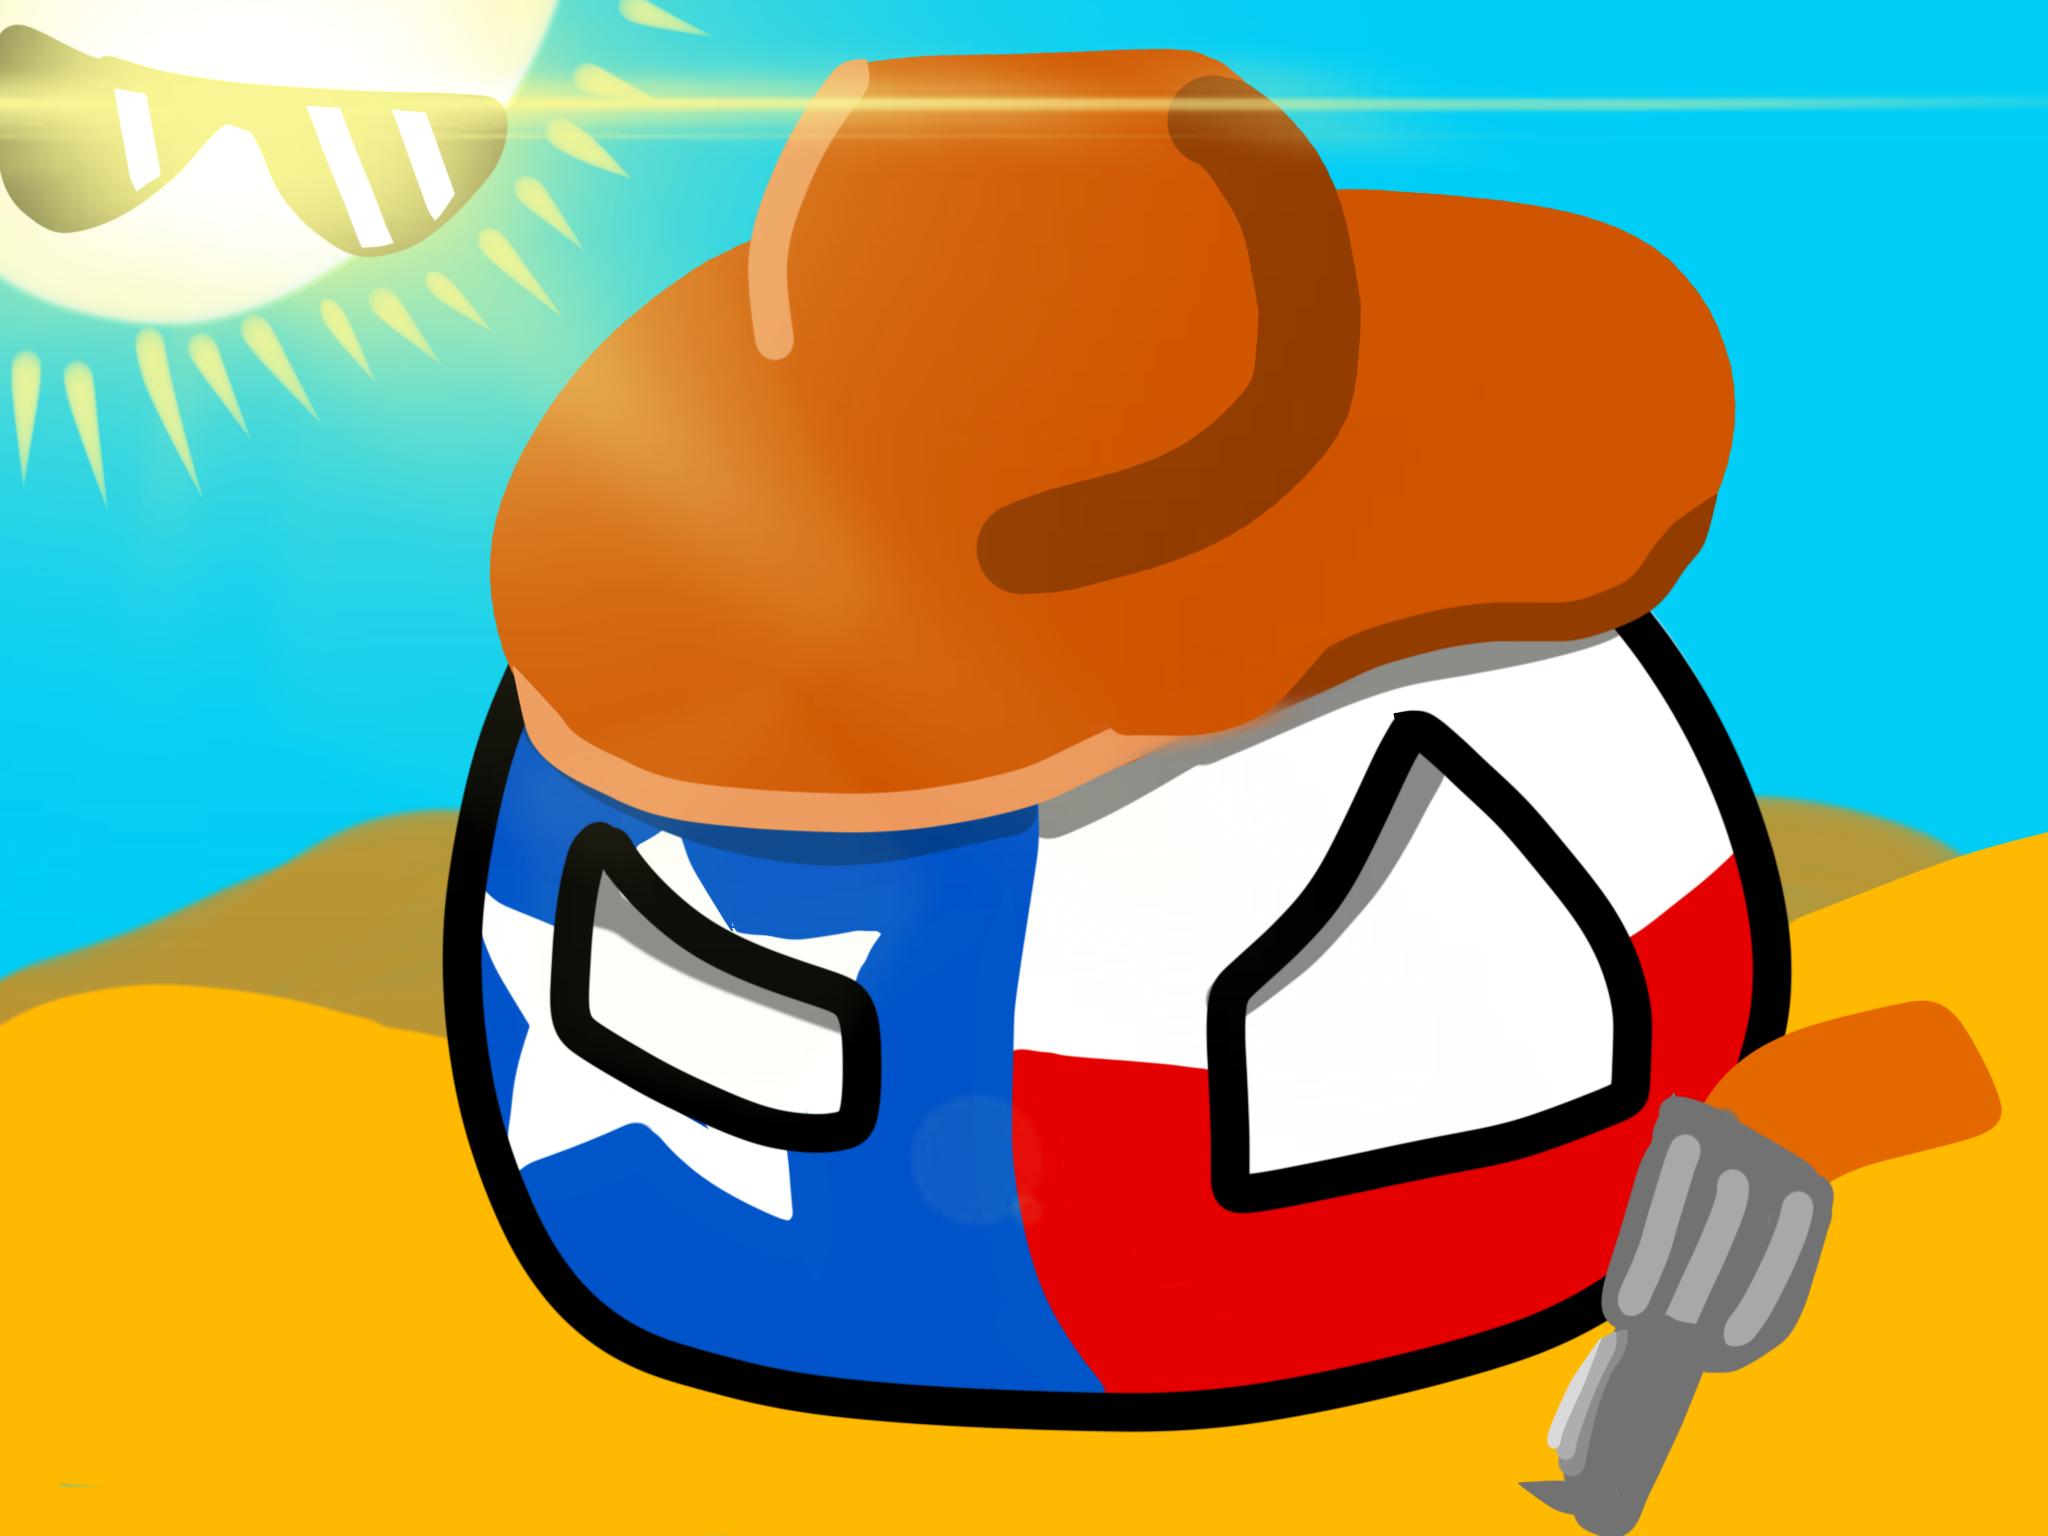 AtlantisballYeah/I was bored so I drew Texas.